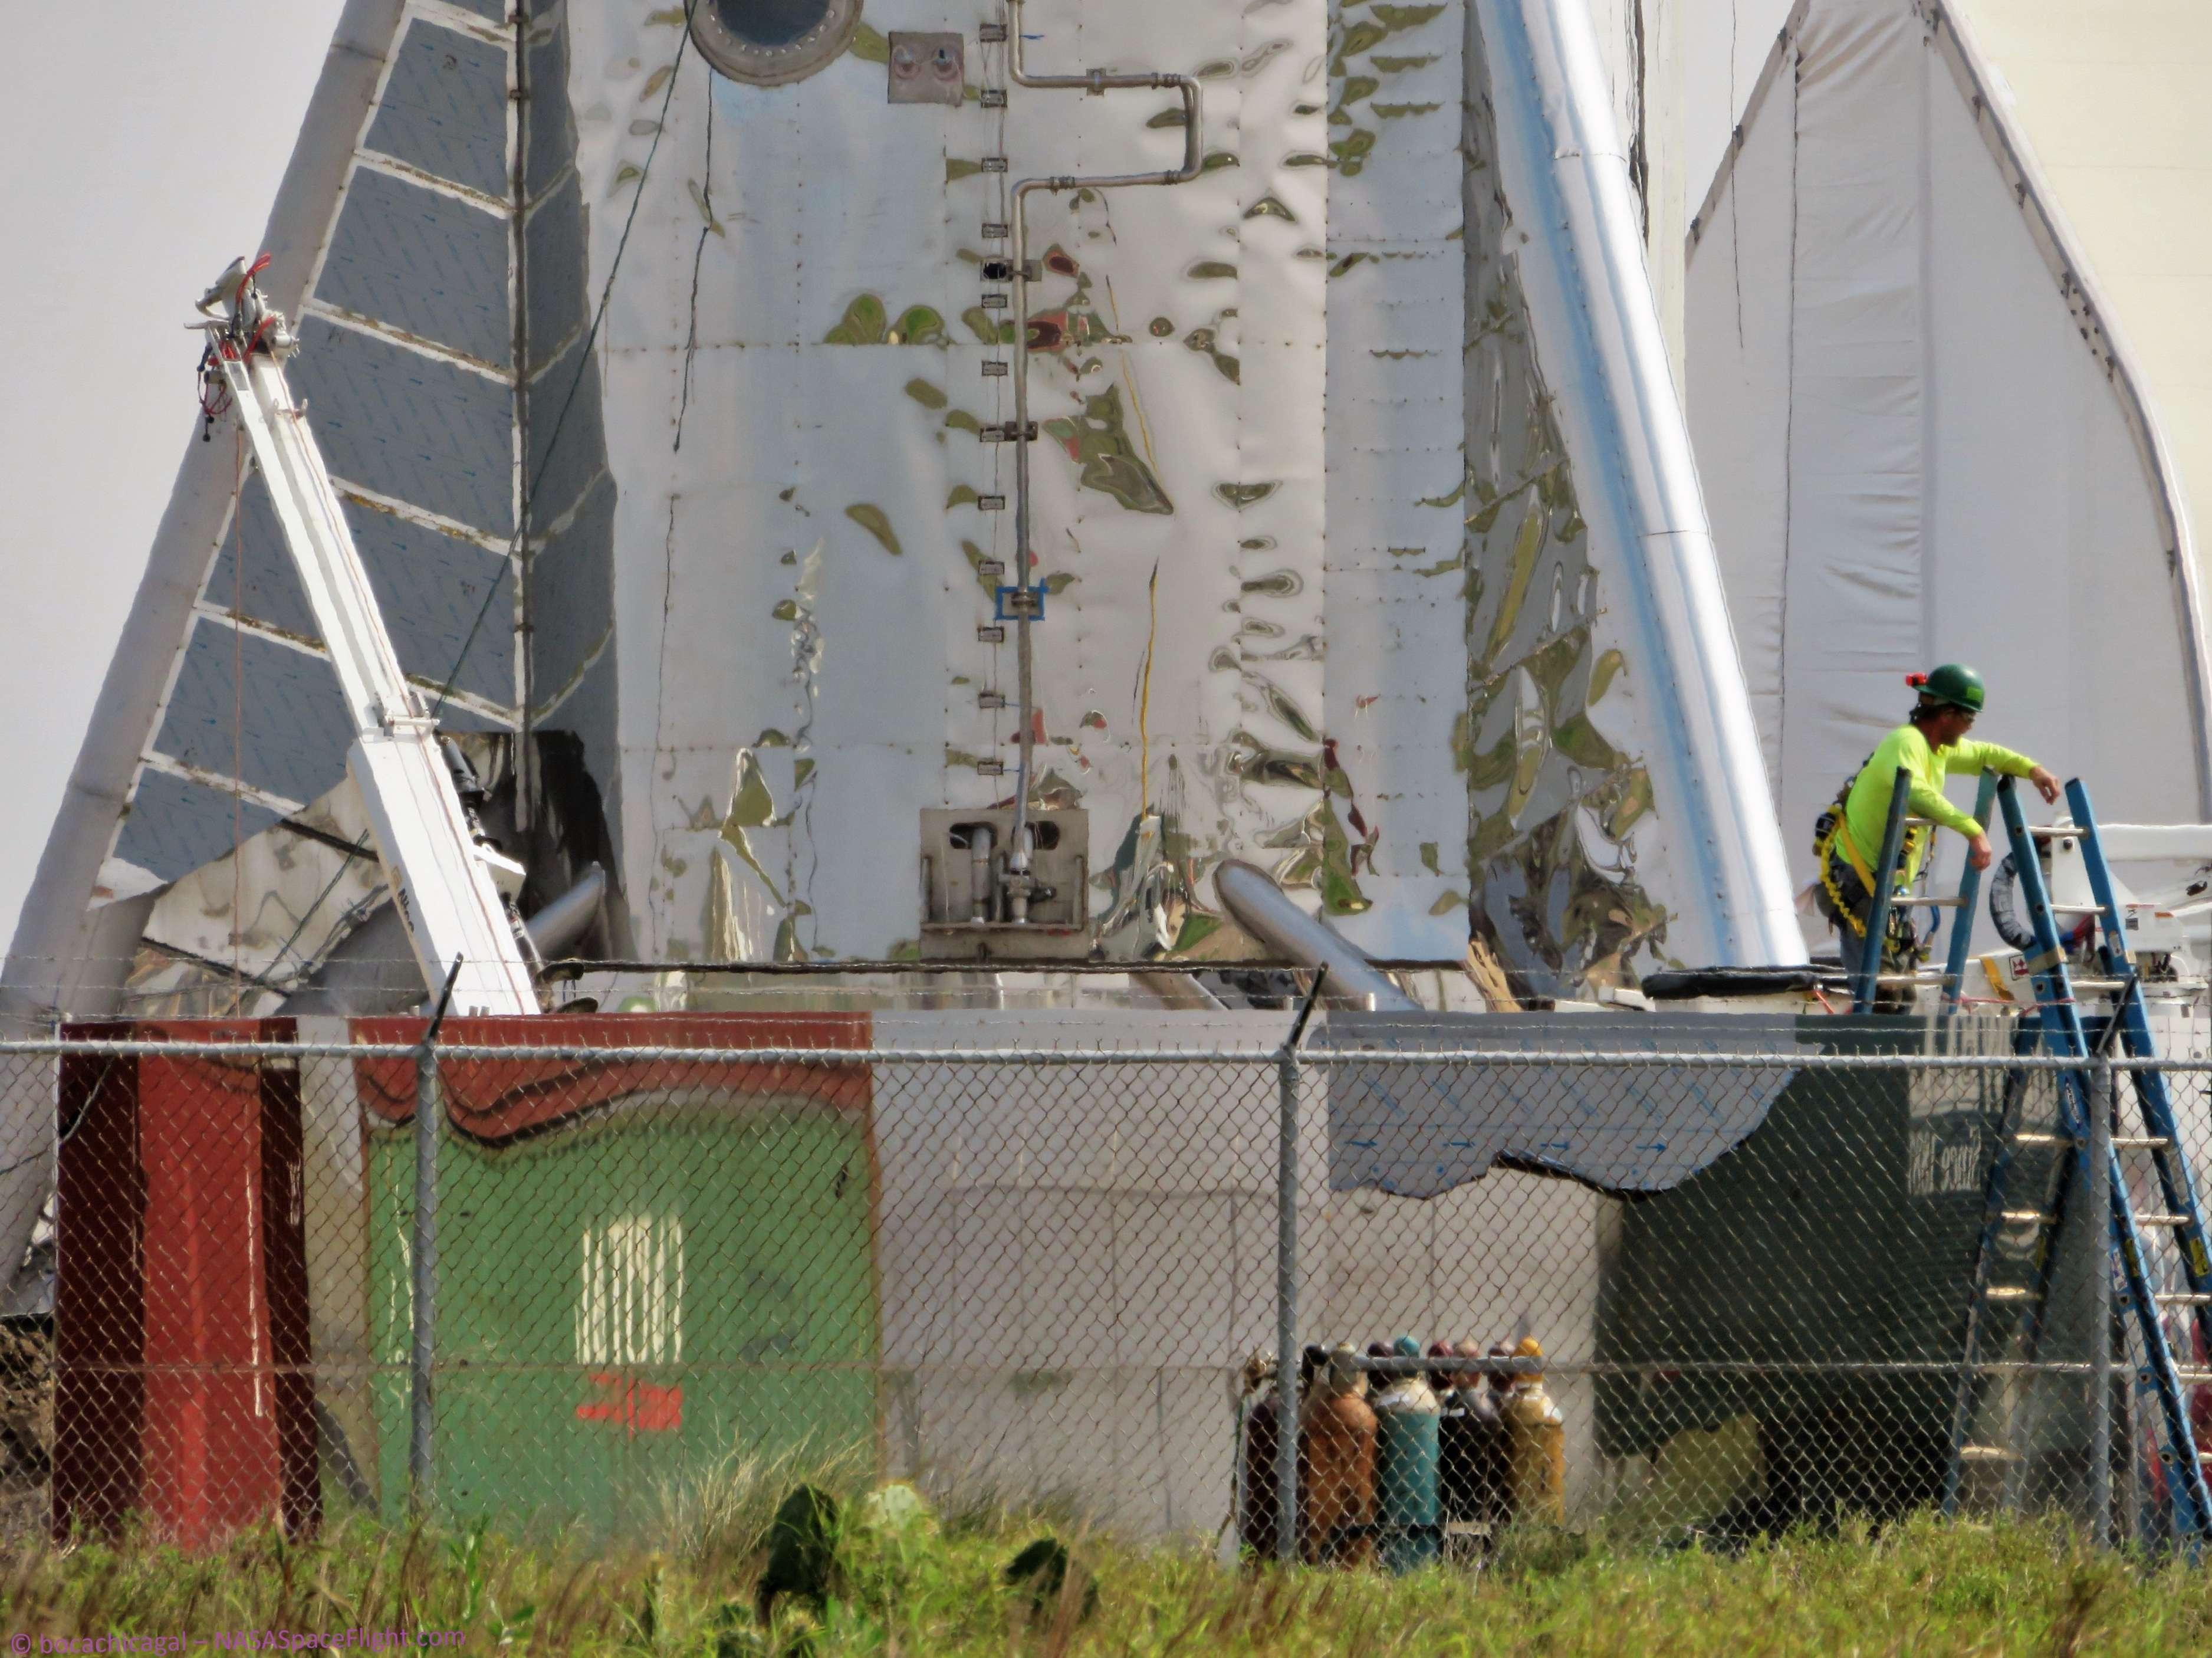 Boca Chica Starship progress 030119 (NASASpaceflight – bocachicagal) 2 (c)